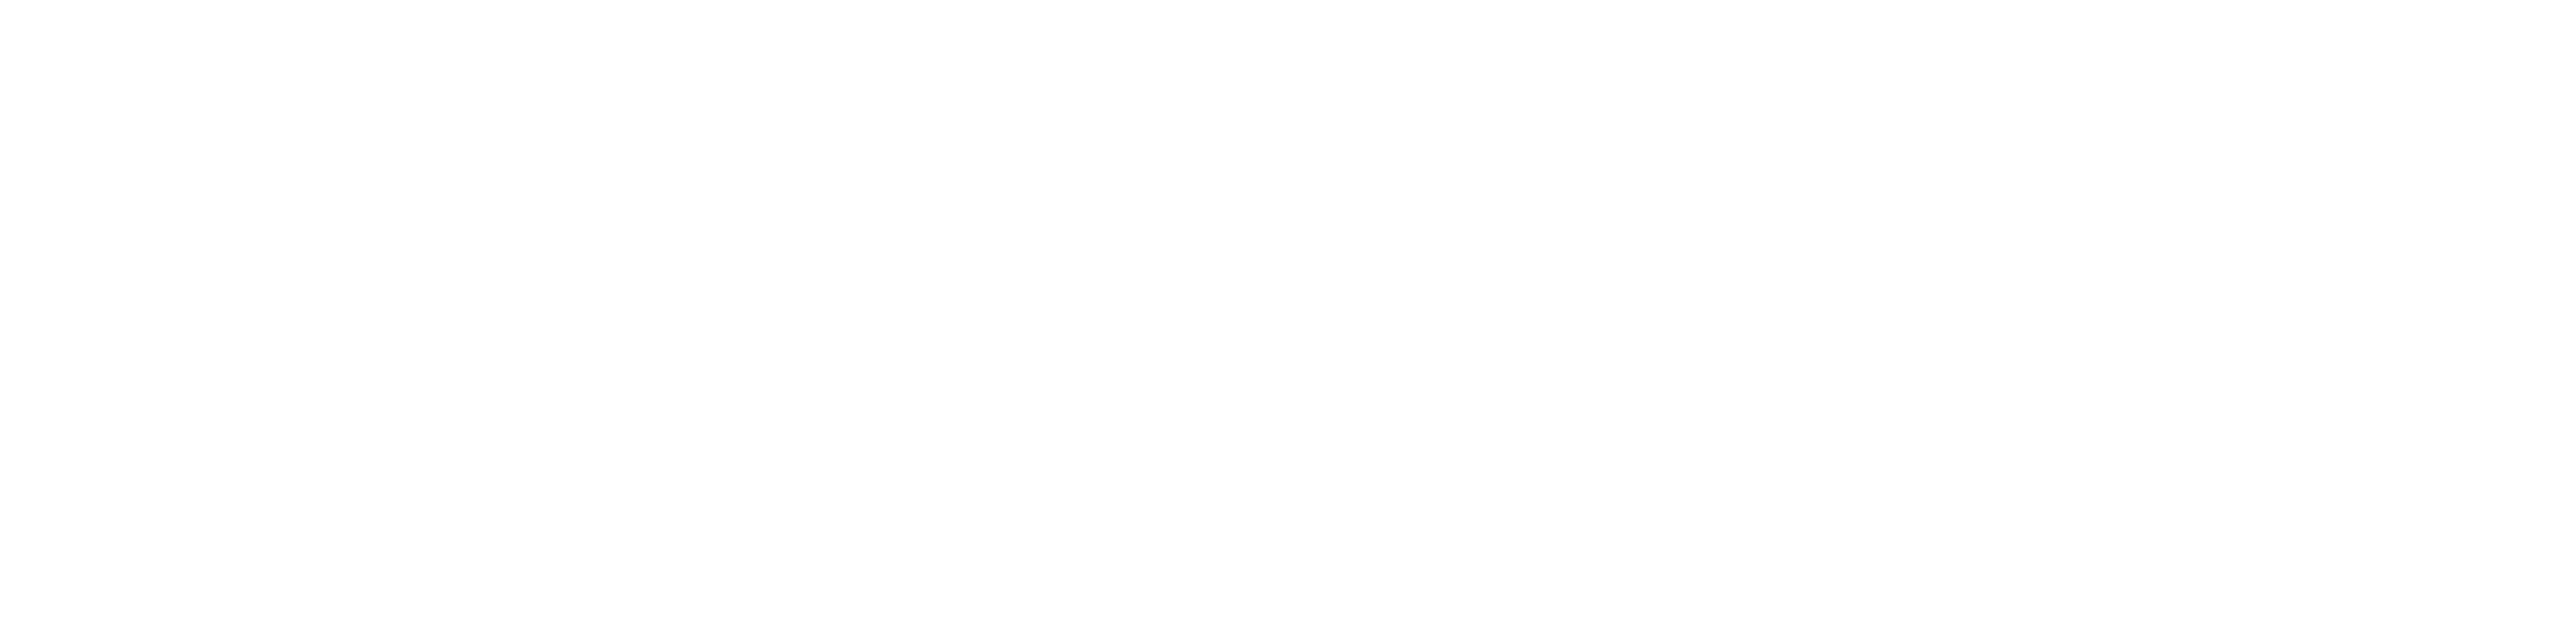 jordan-white